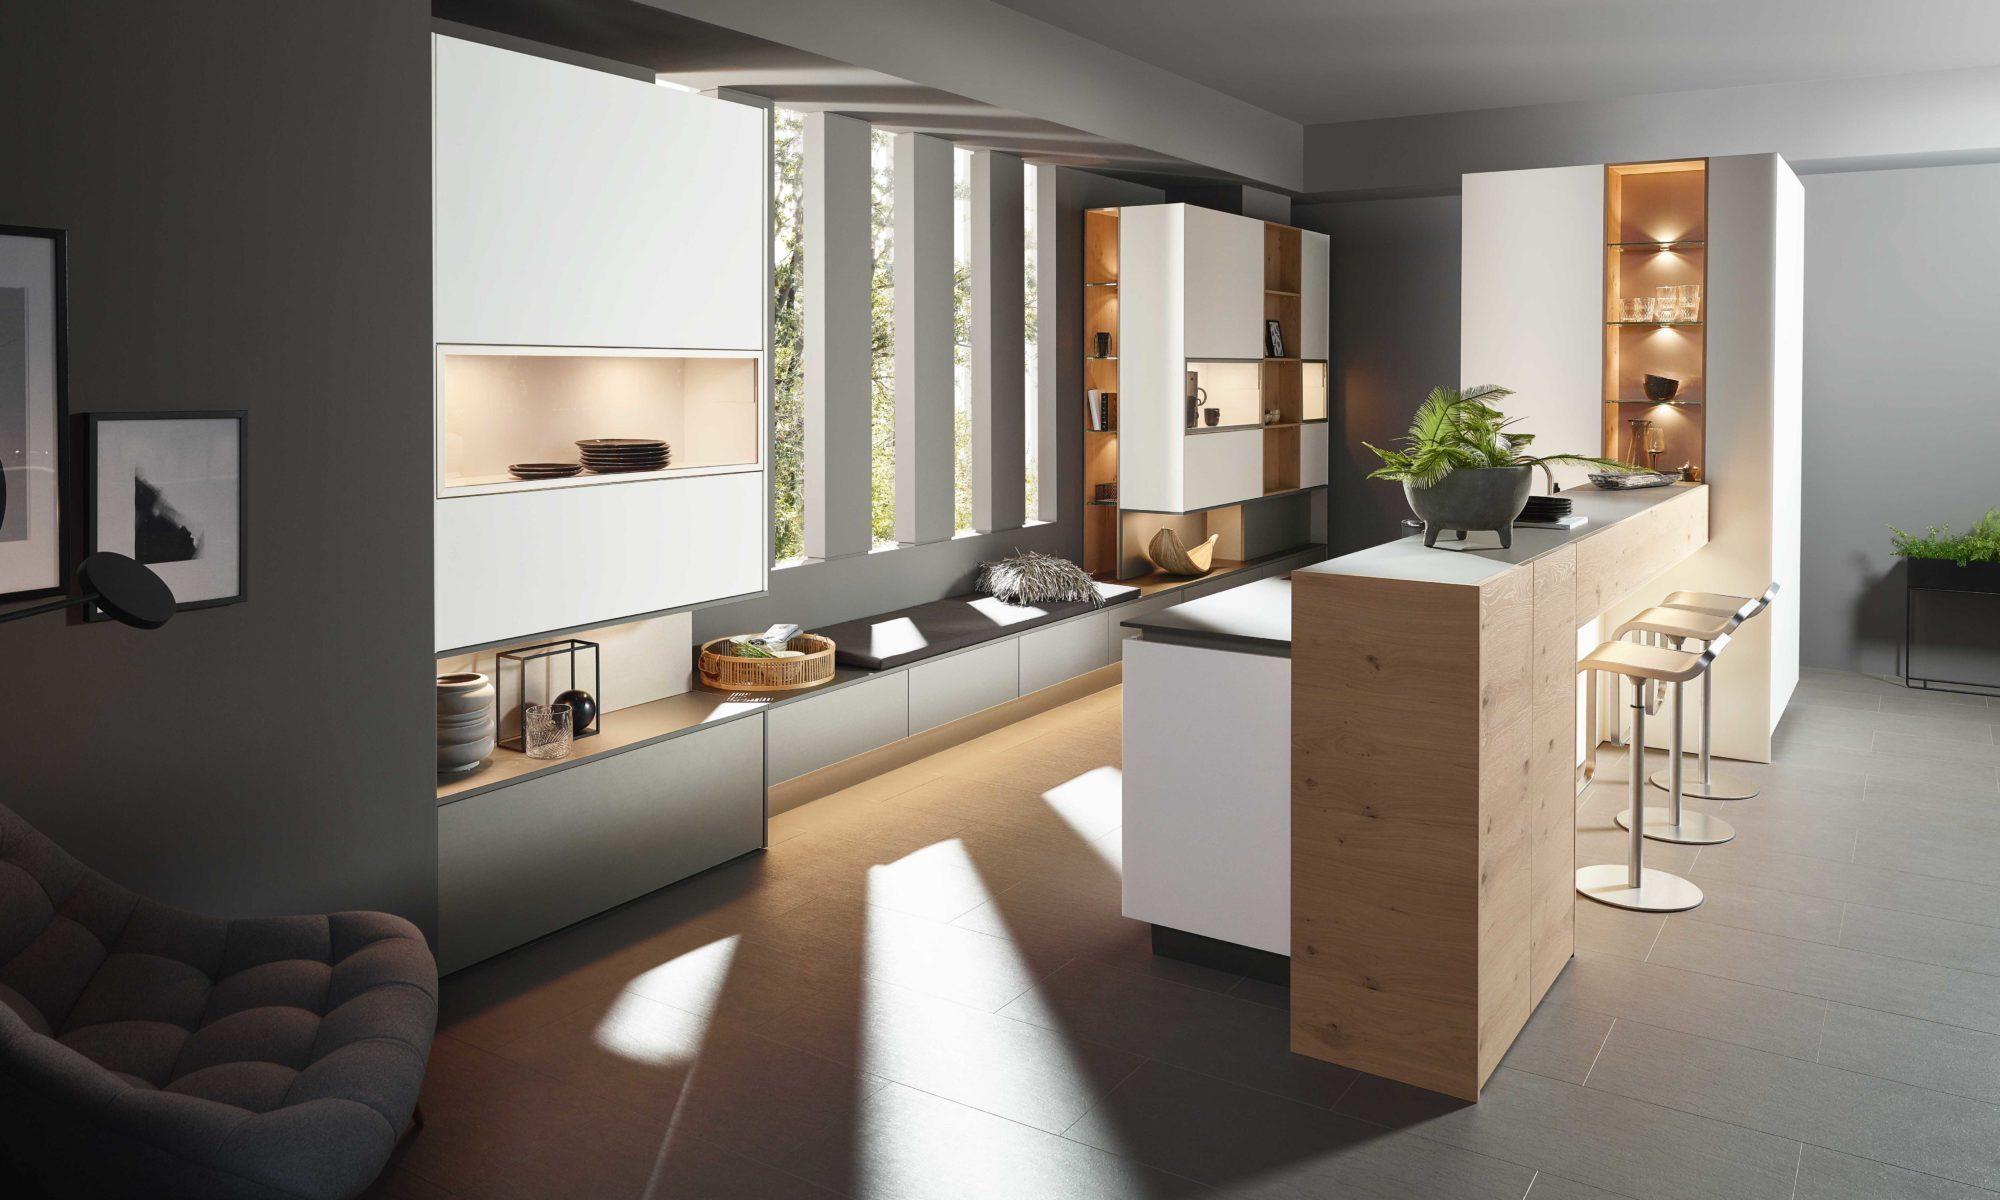 Sachsen Küchen, Adina, Felina, Franka, Holz, Design, grau, modern,